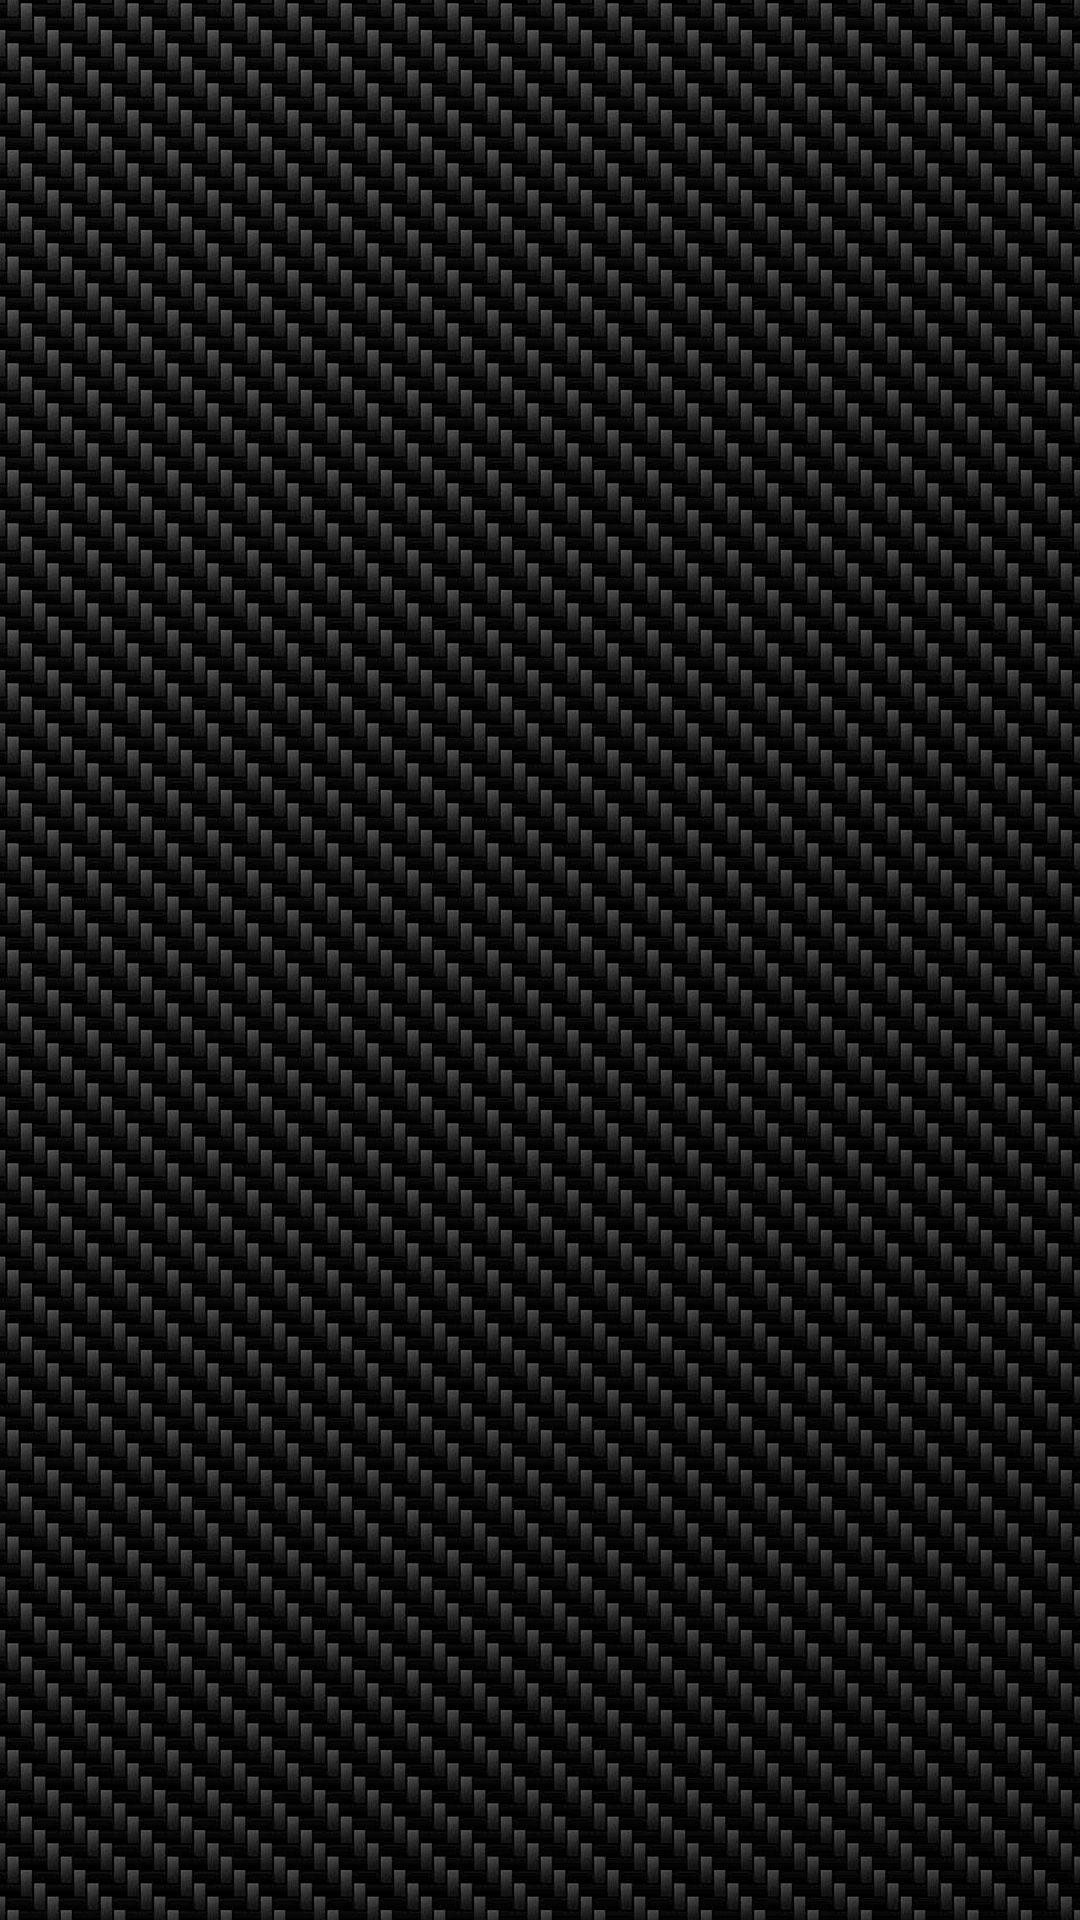 Pin by Dantee Benton on Wallpapers Carbon fiber